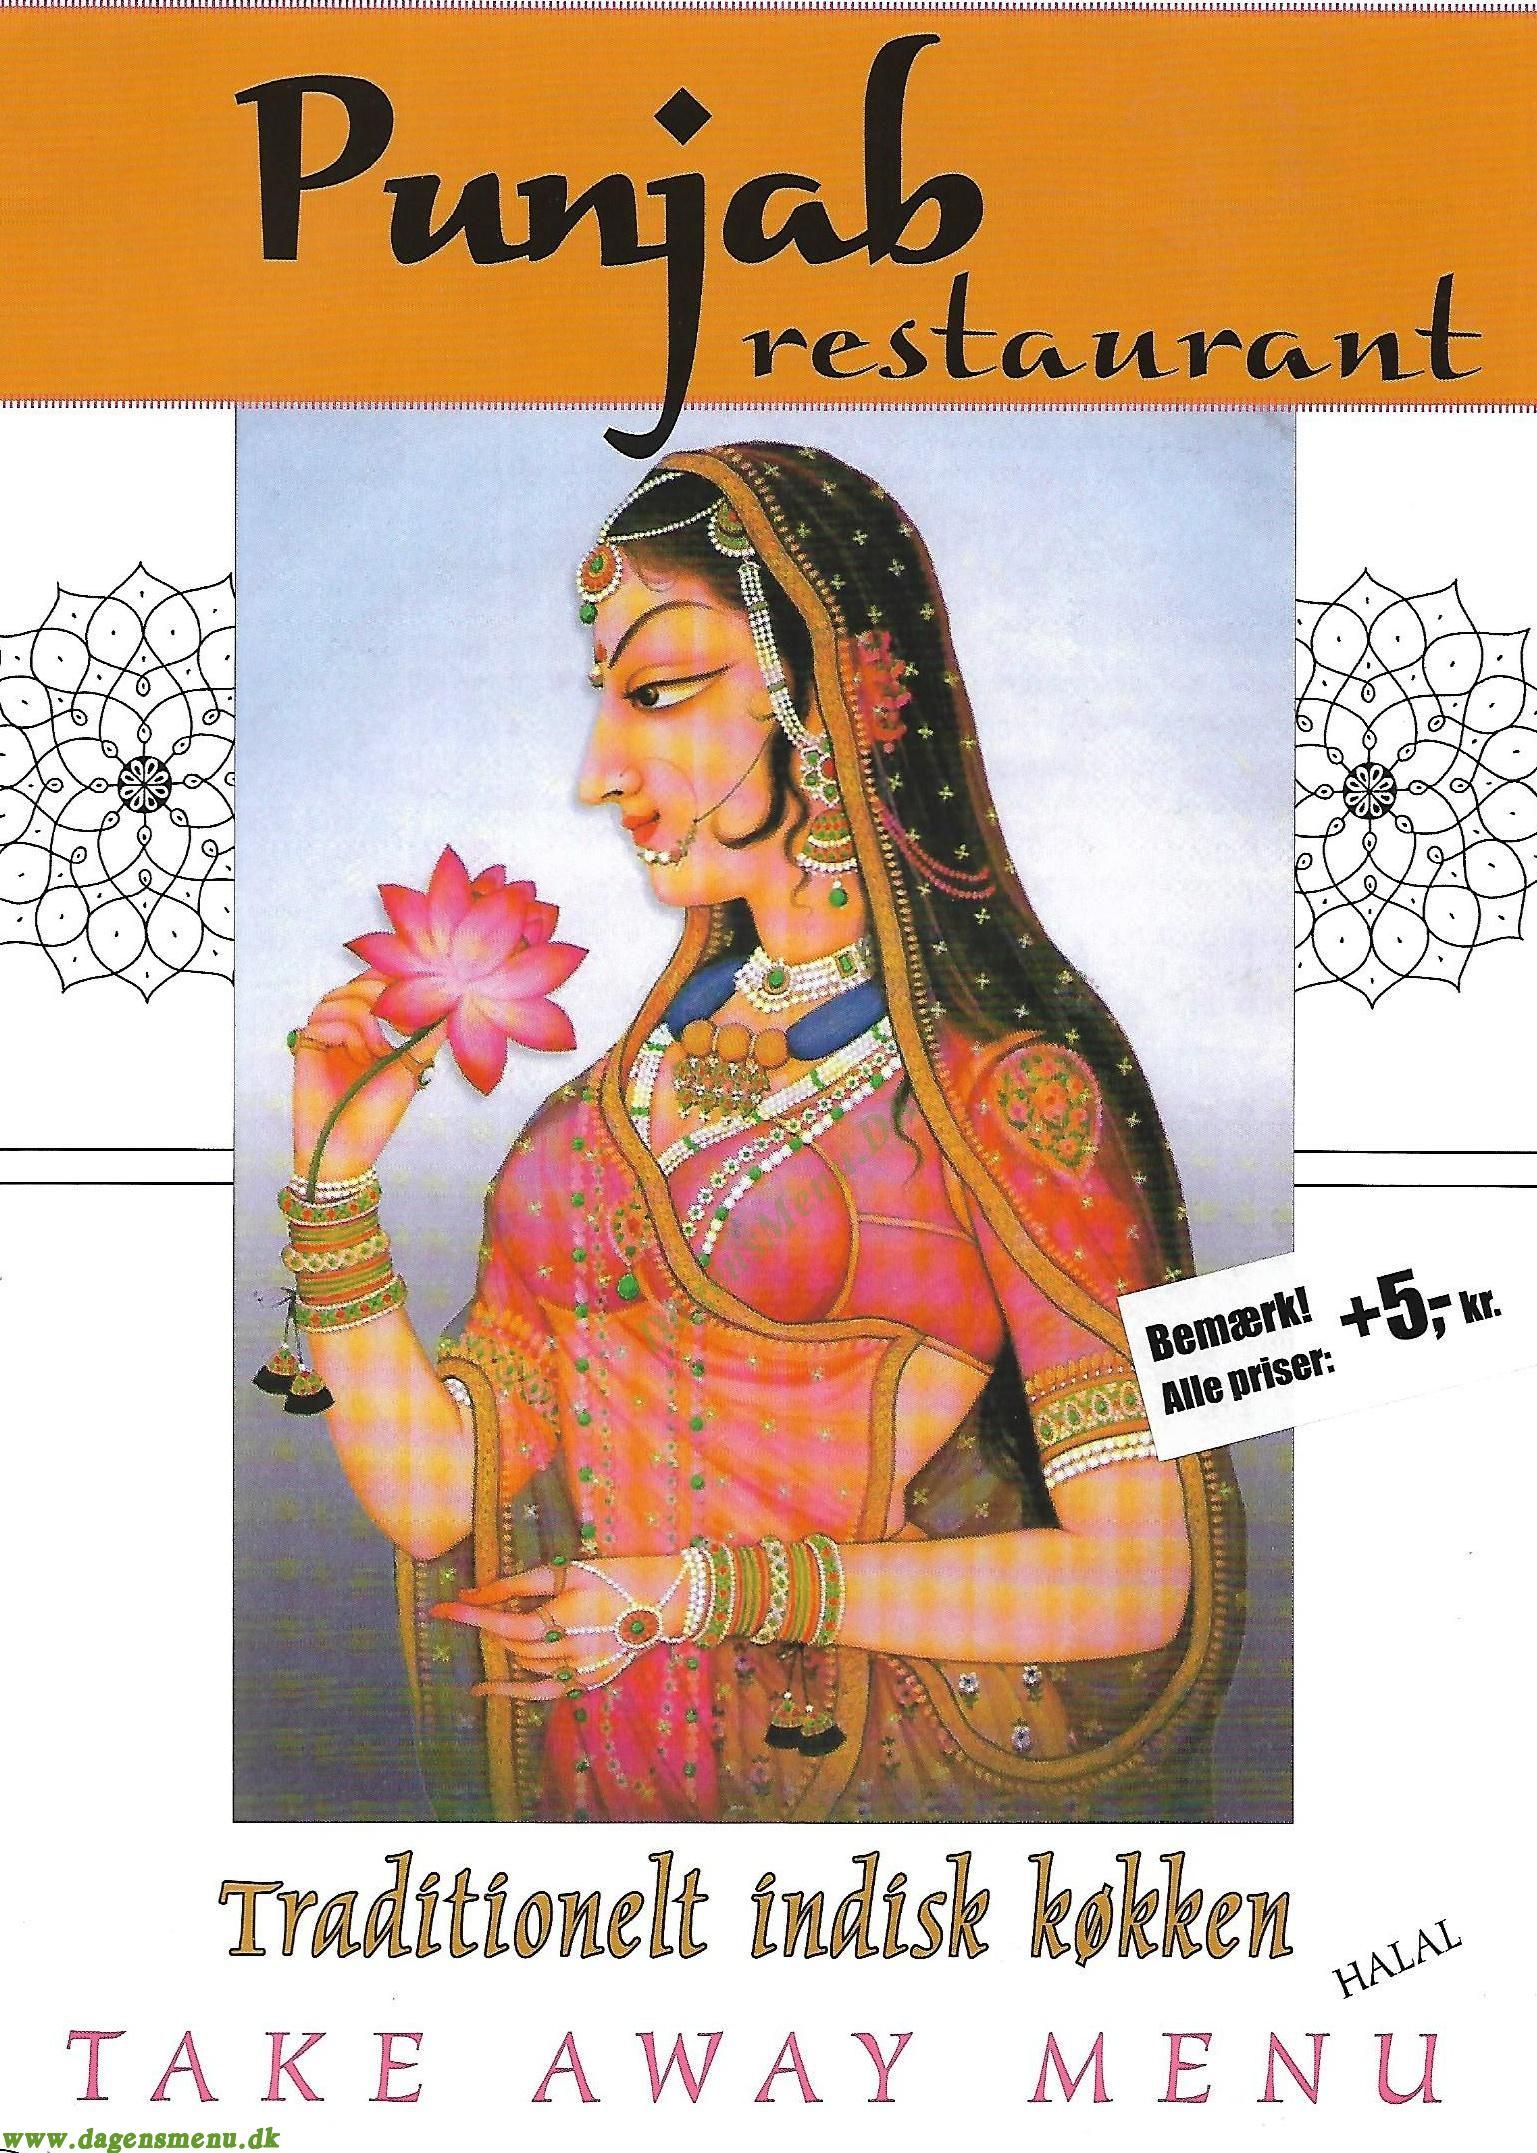 Punjab Restaurant - Menukort